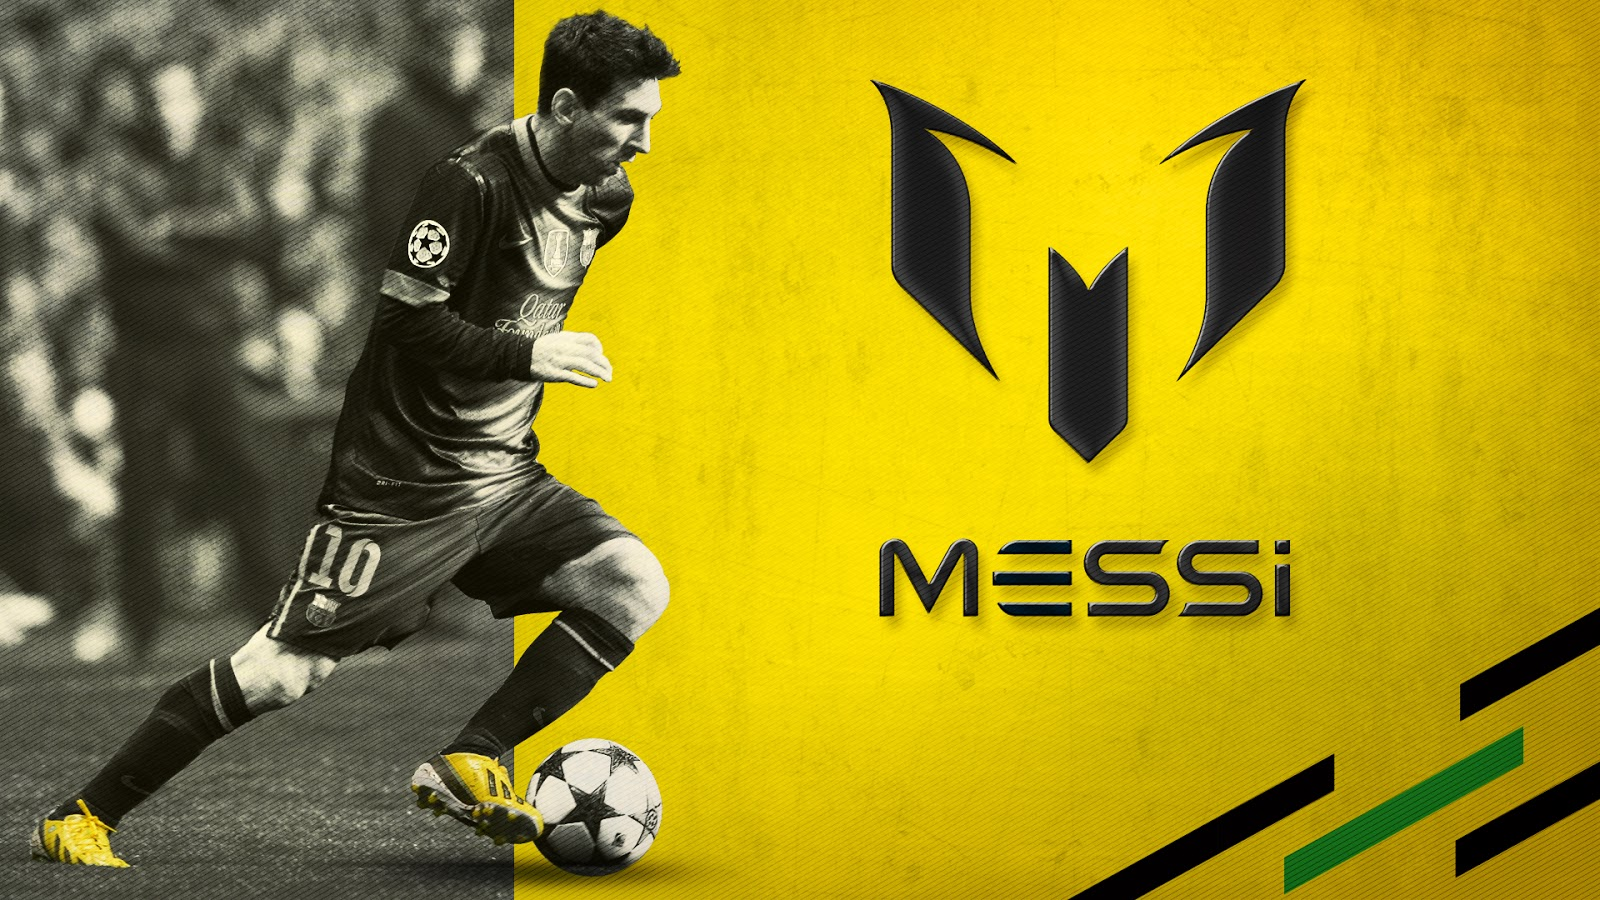 Messi Wallpaper Wide